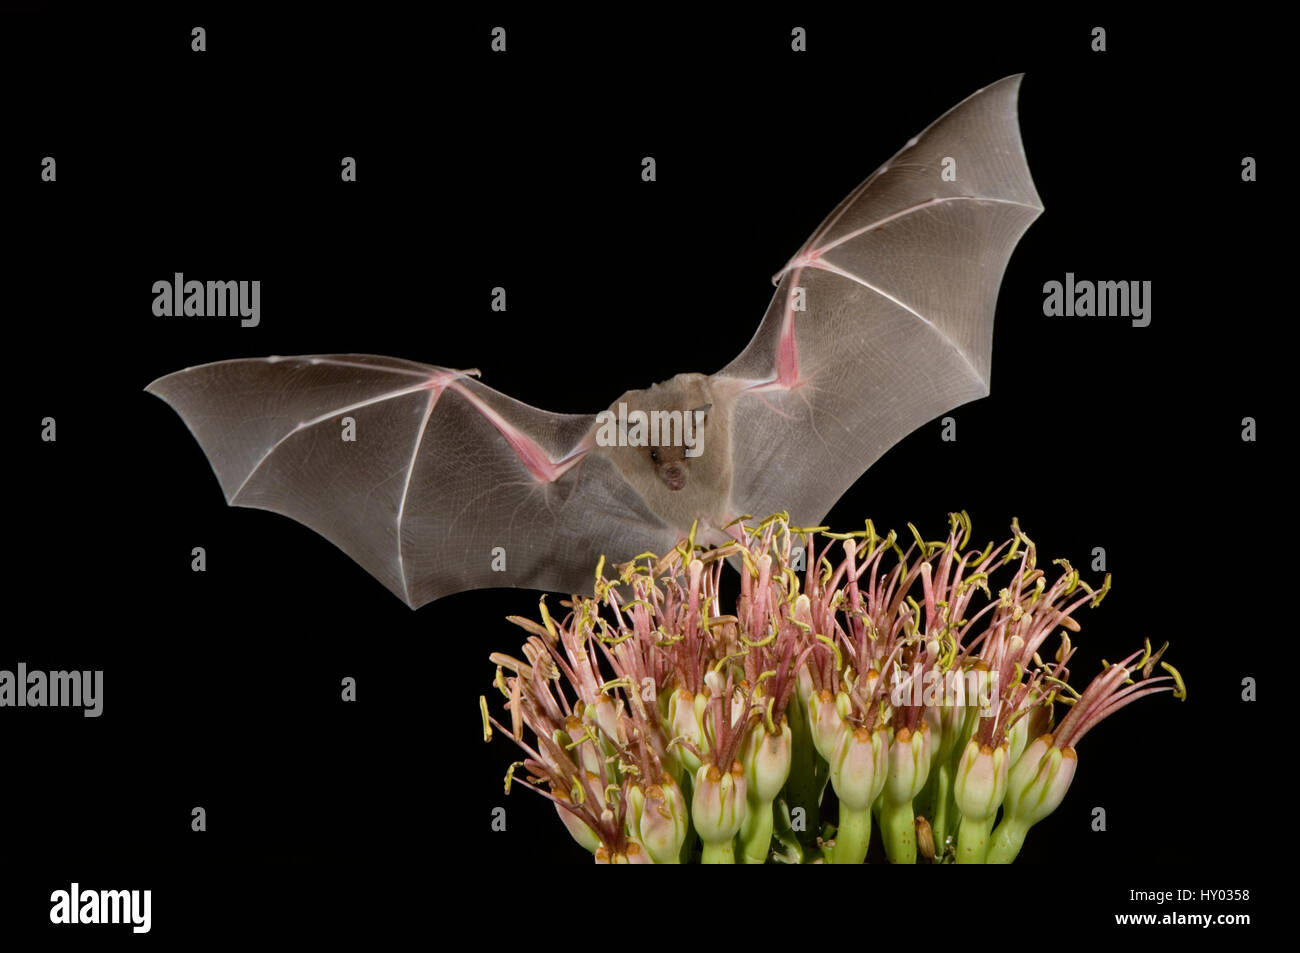 Lesser Long-nosed Bat (Leptonycteris curasoae) flying at night to feed on Agave flower (Agave sp). Tuscon, Arizona, Stock Photo